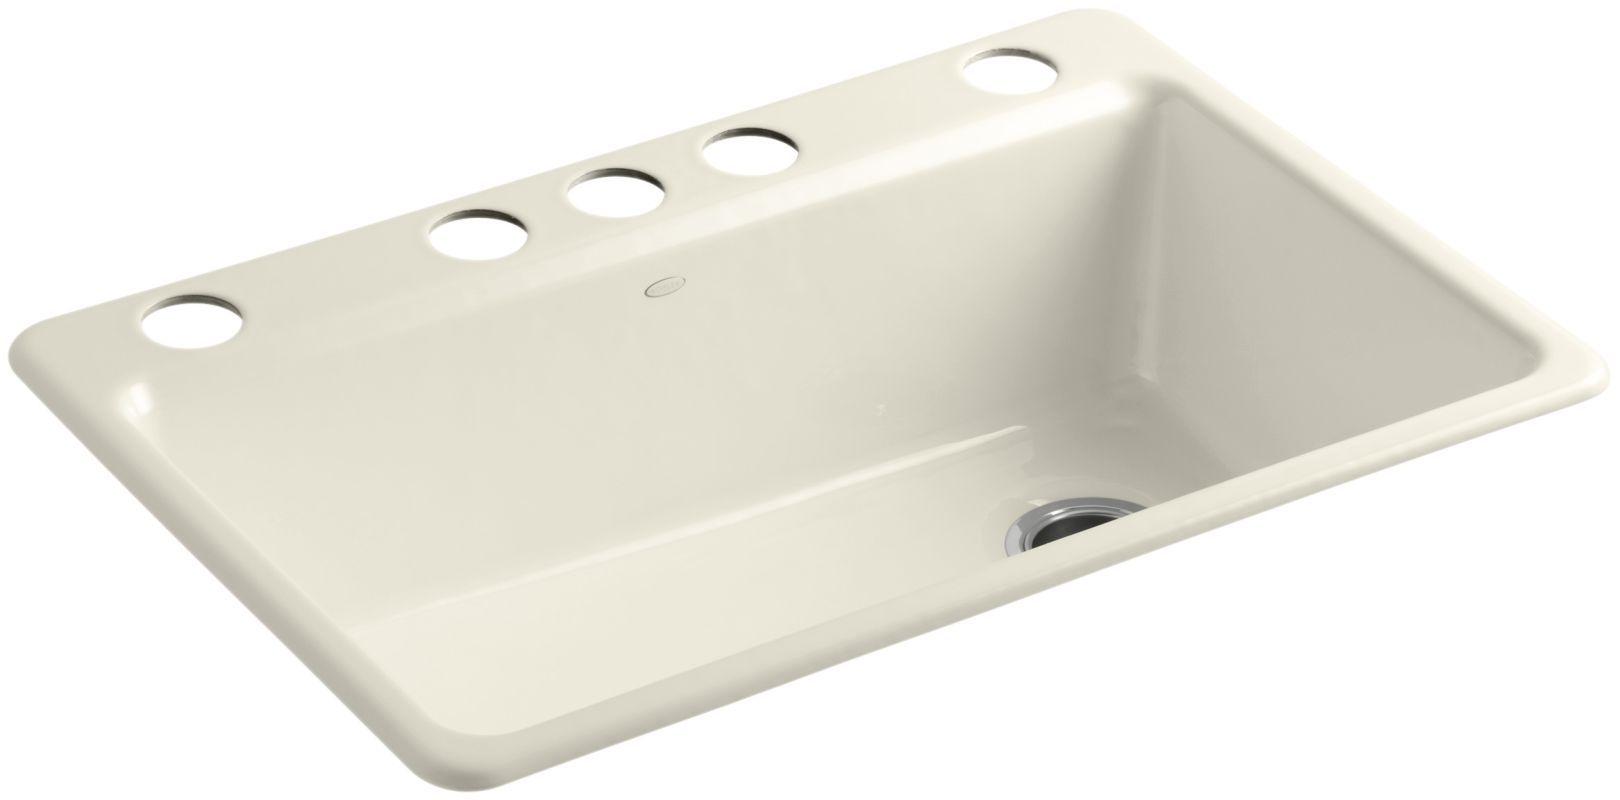 Kohler K 5871 5ua3 Single Bowl Kitchen Sink Cast Iron Kitchen